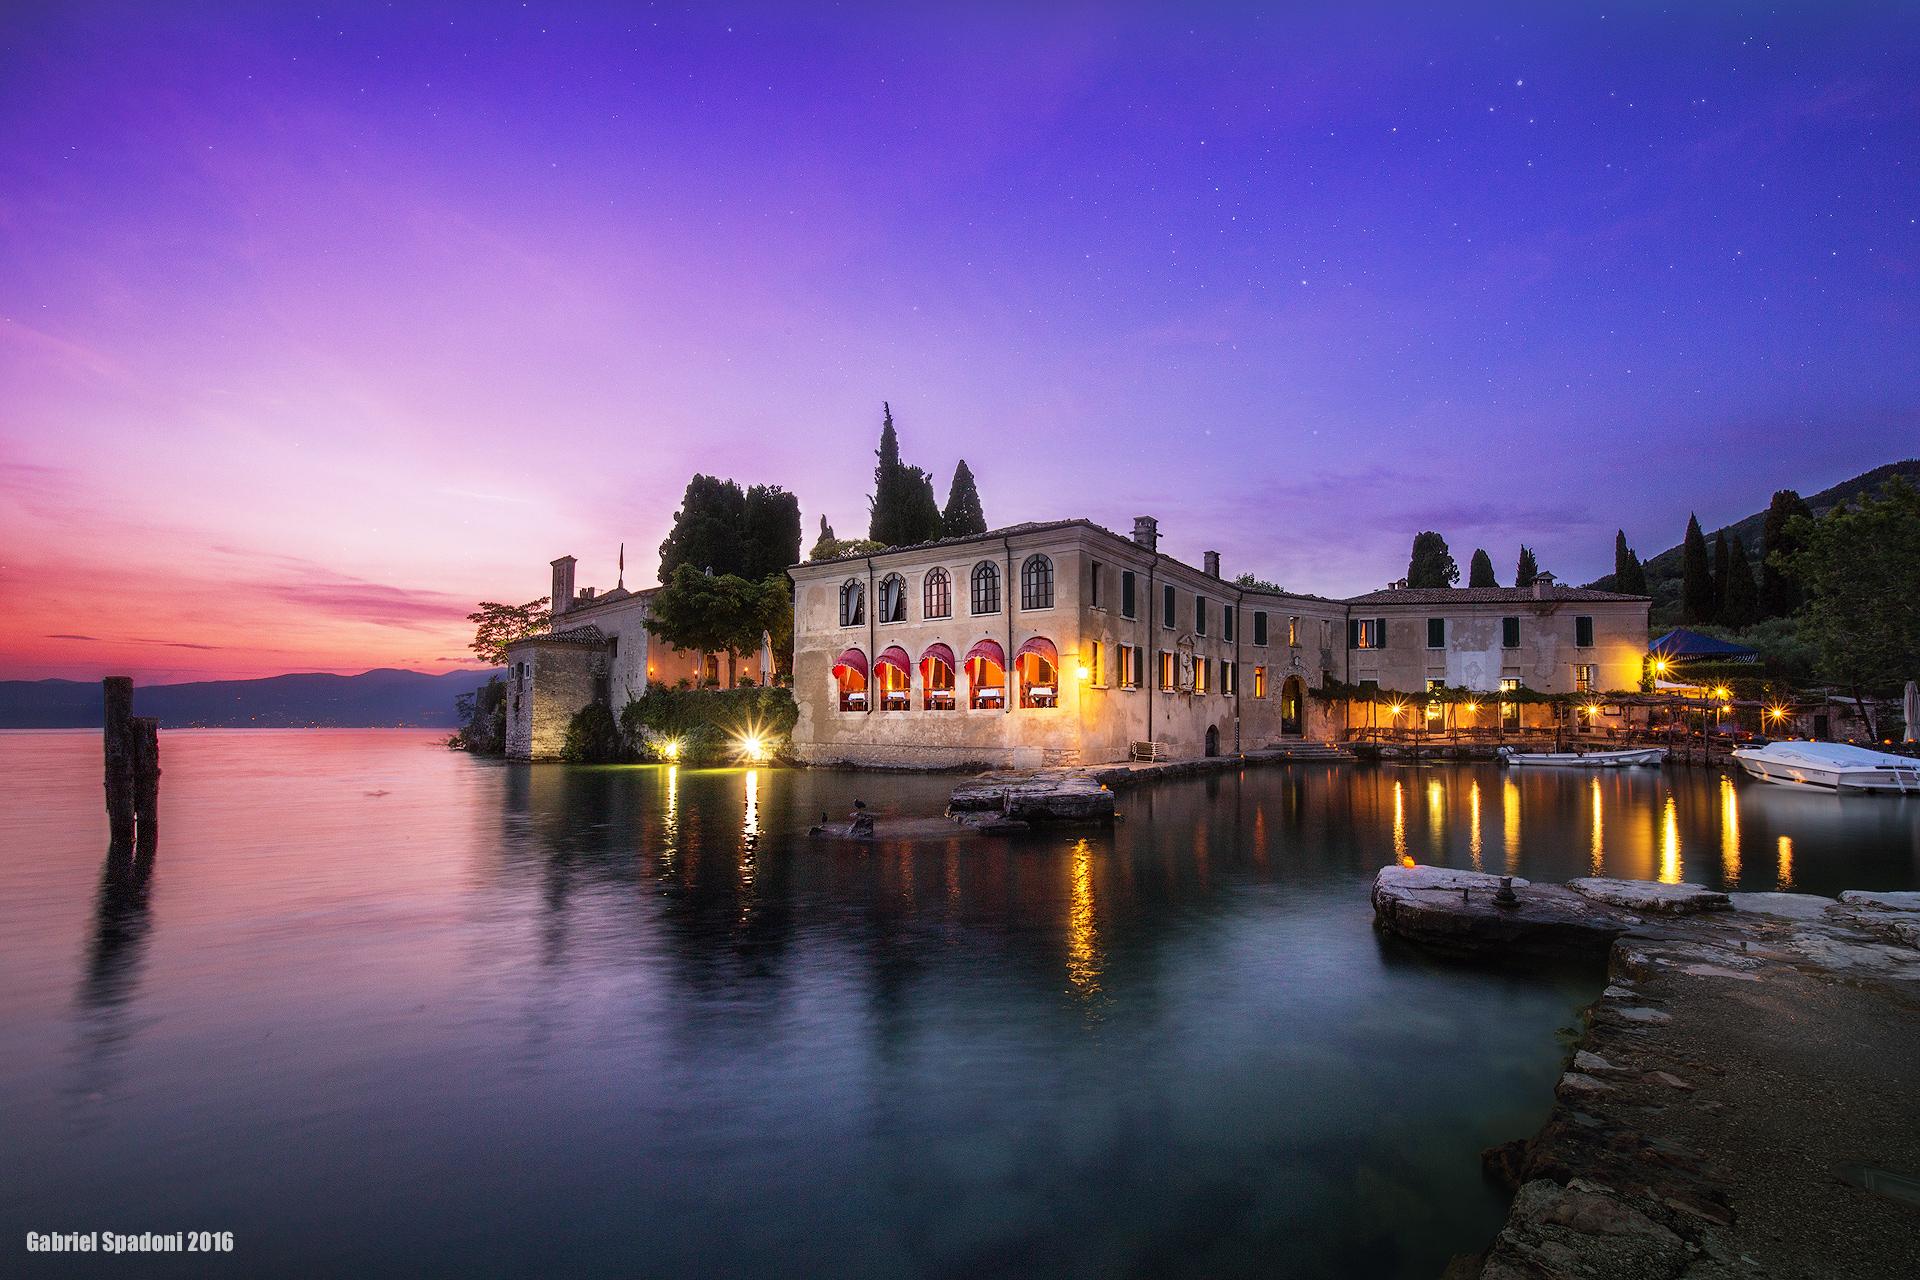 The villa on the lake at sunset...